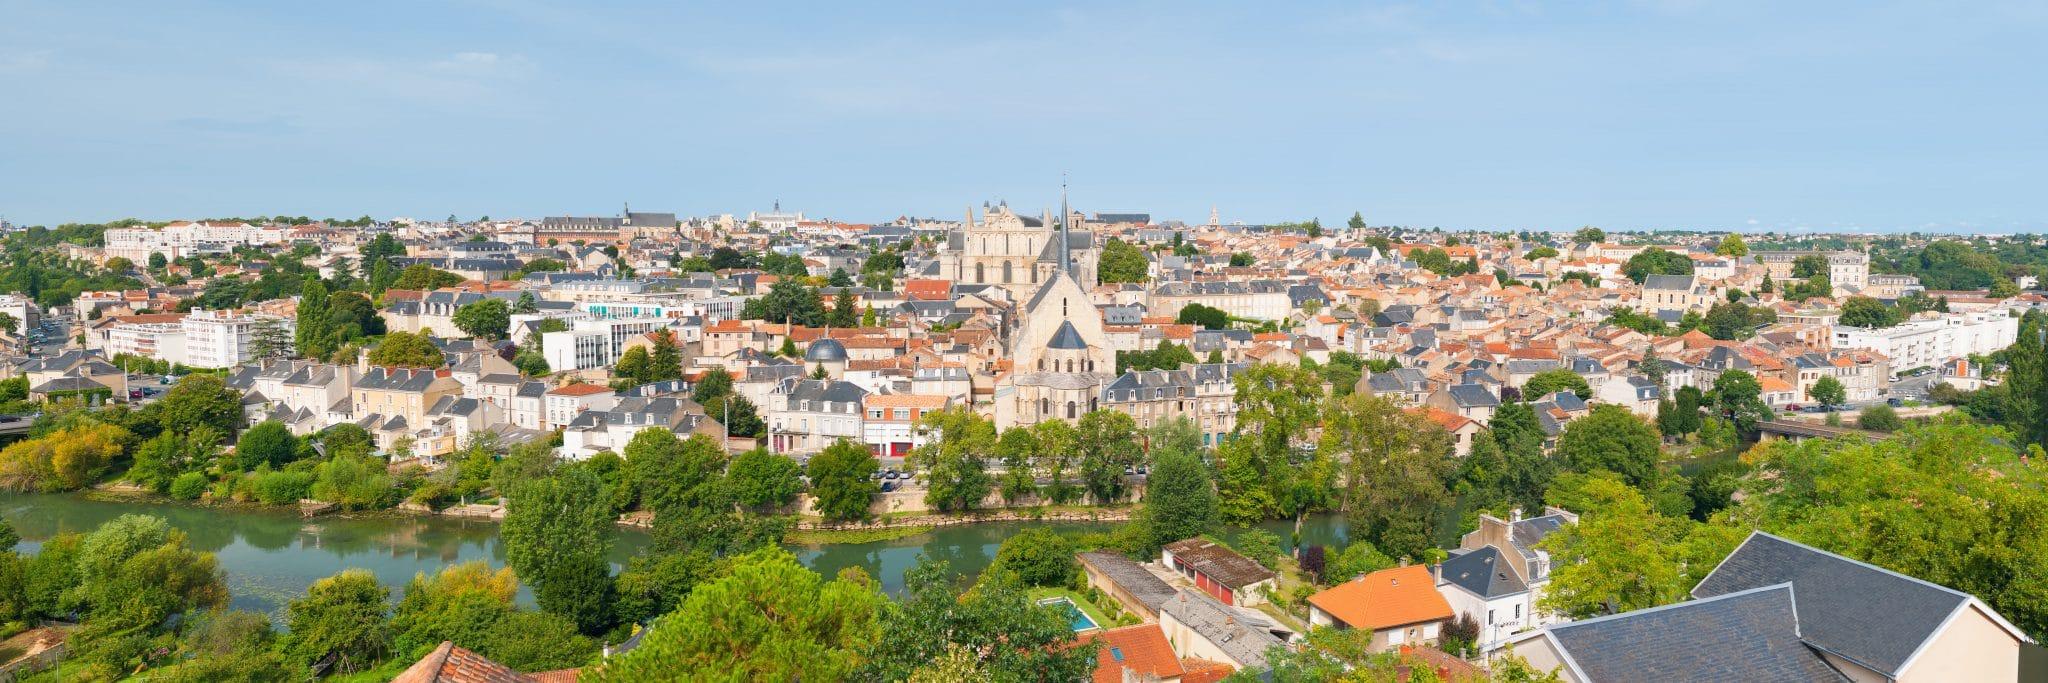 illiCO travaux Poitiers